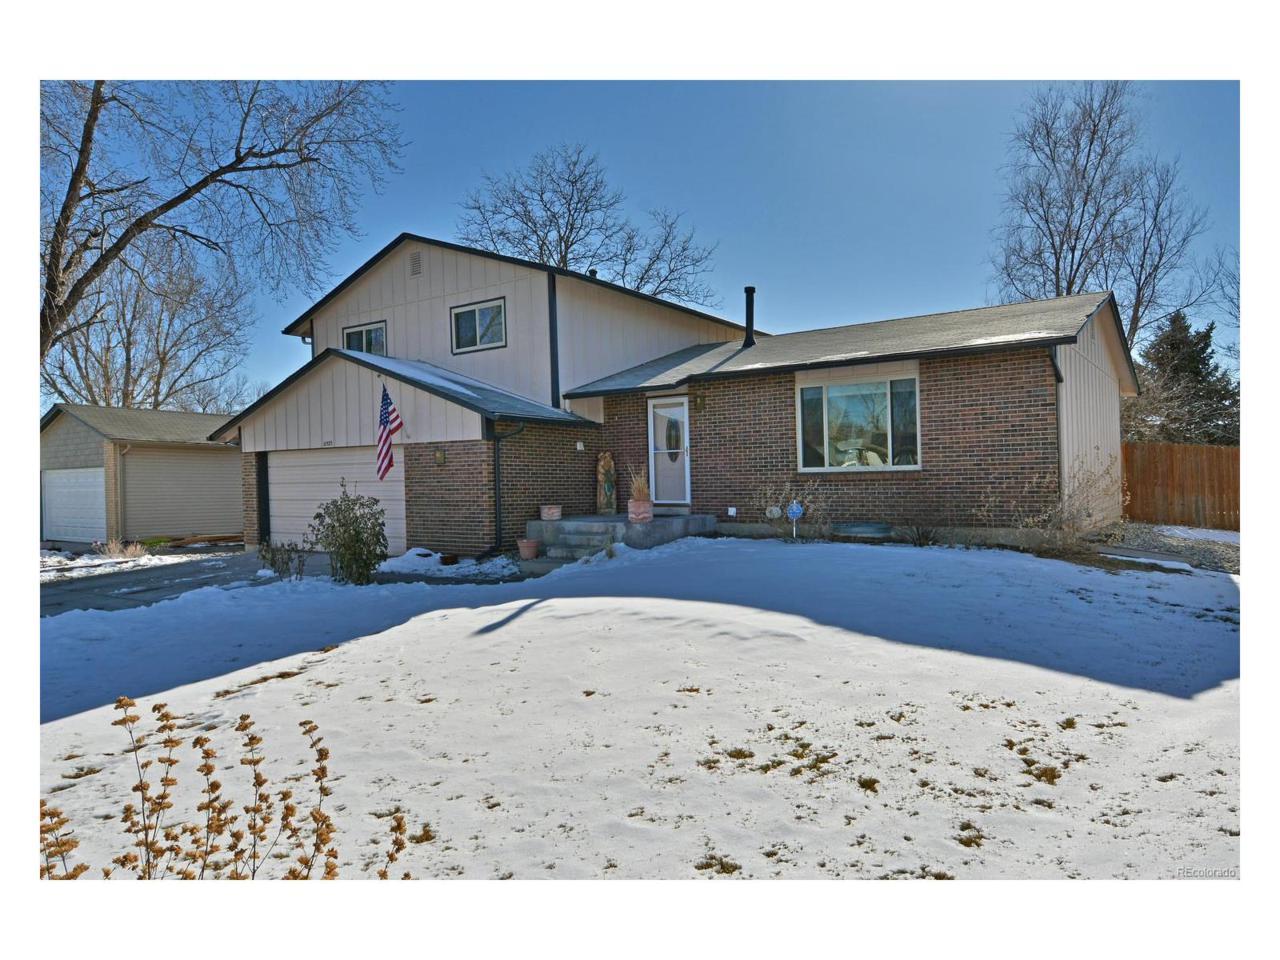 11523 Garfield Way, Thornton, CO 80233 (#7044909) :: The Peak Properties Group